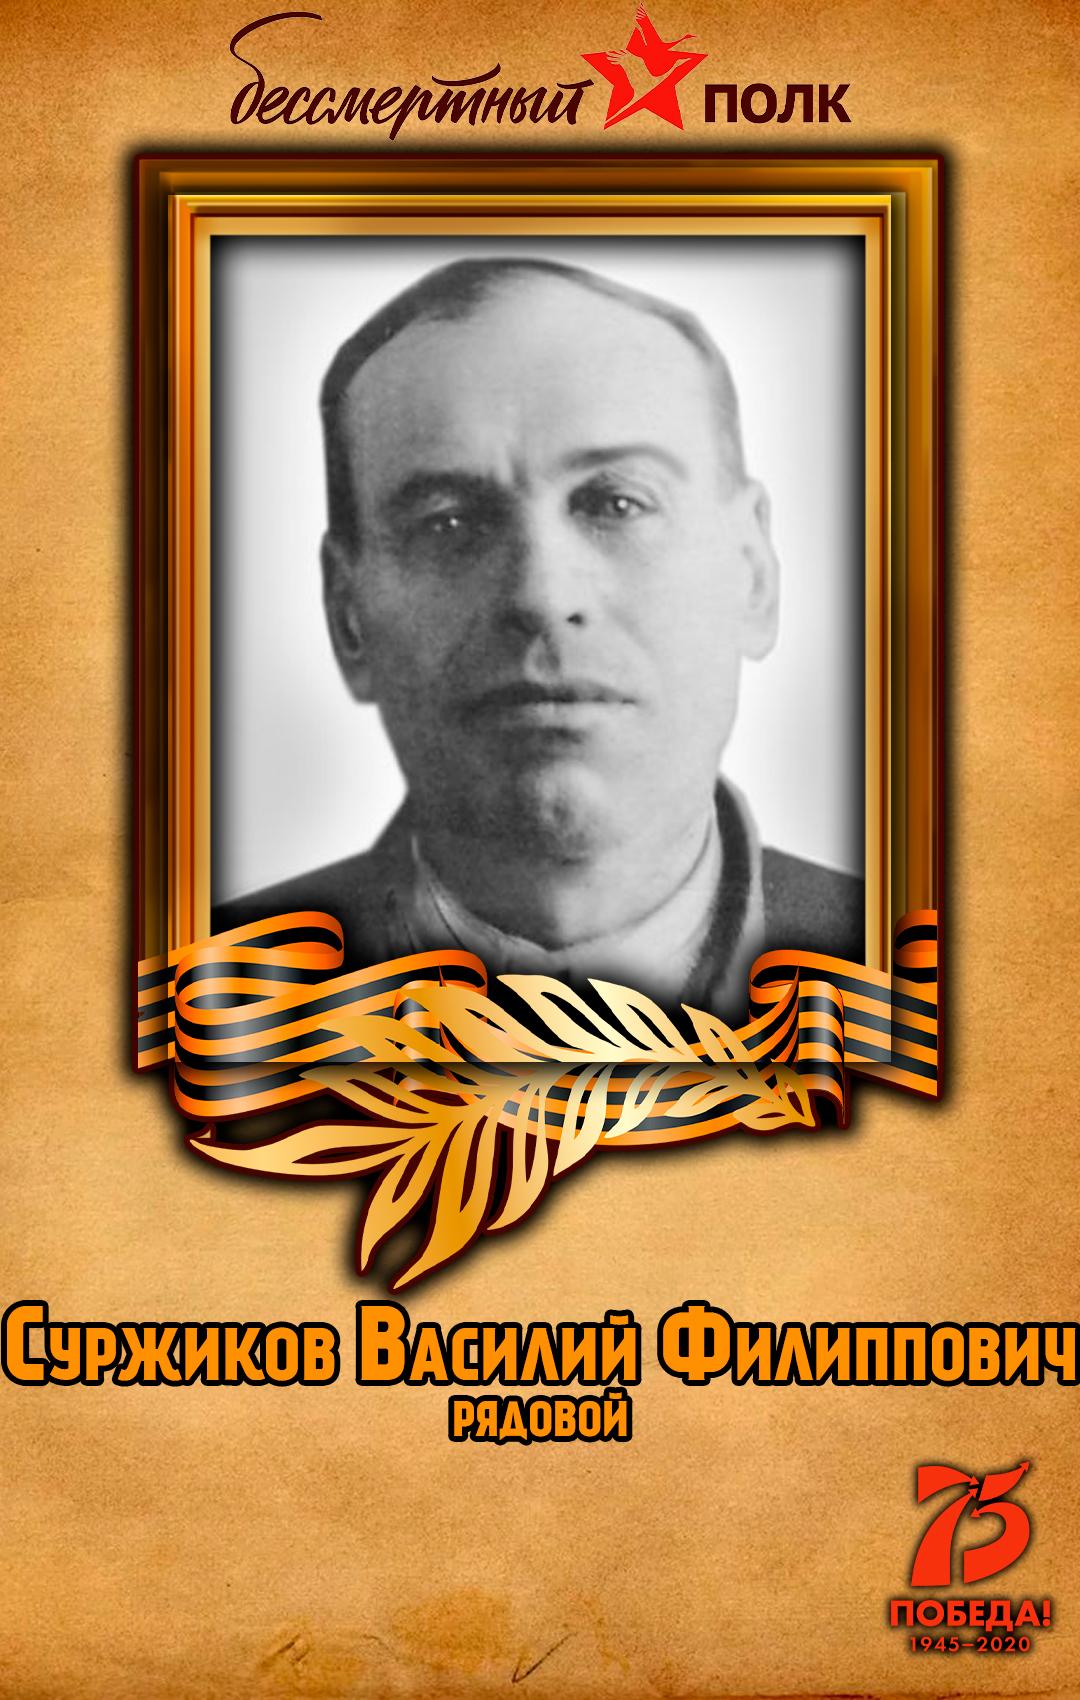 Суржиков-Василий-Филиппович